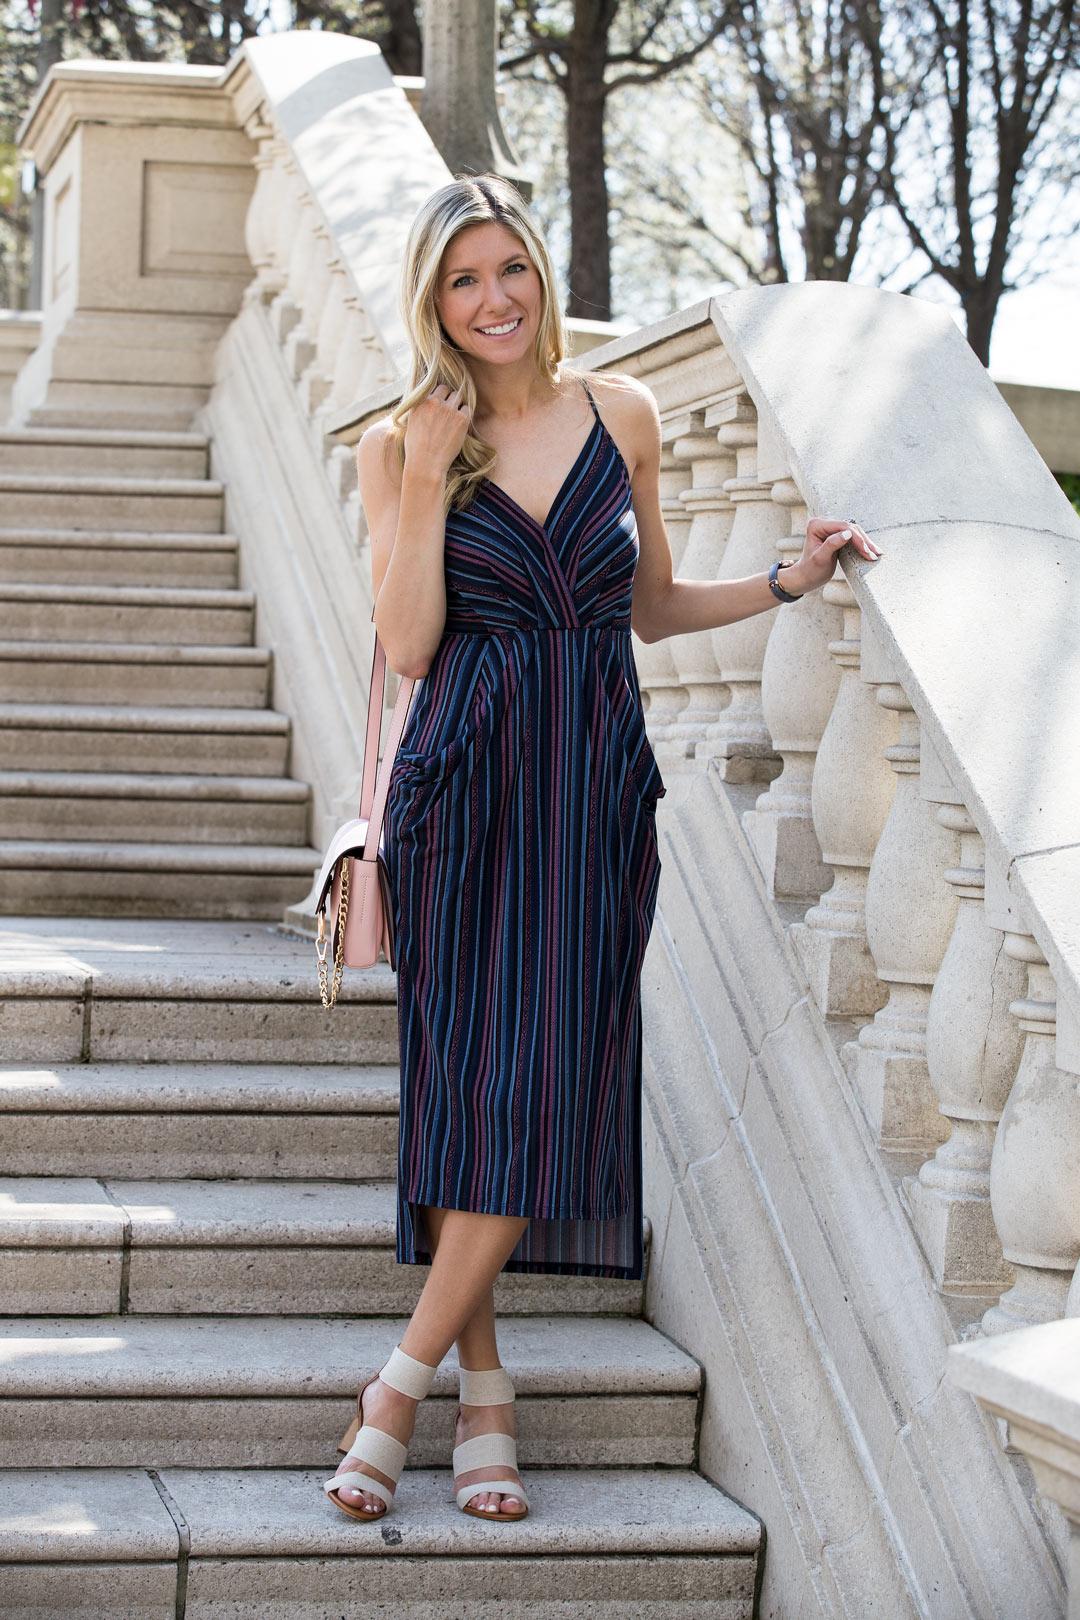 striped midi dress in Millenium park in chicago